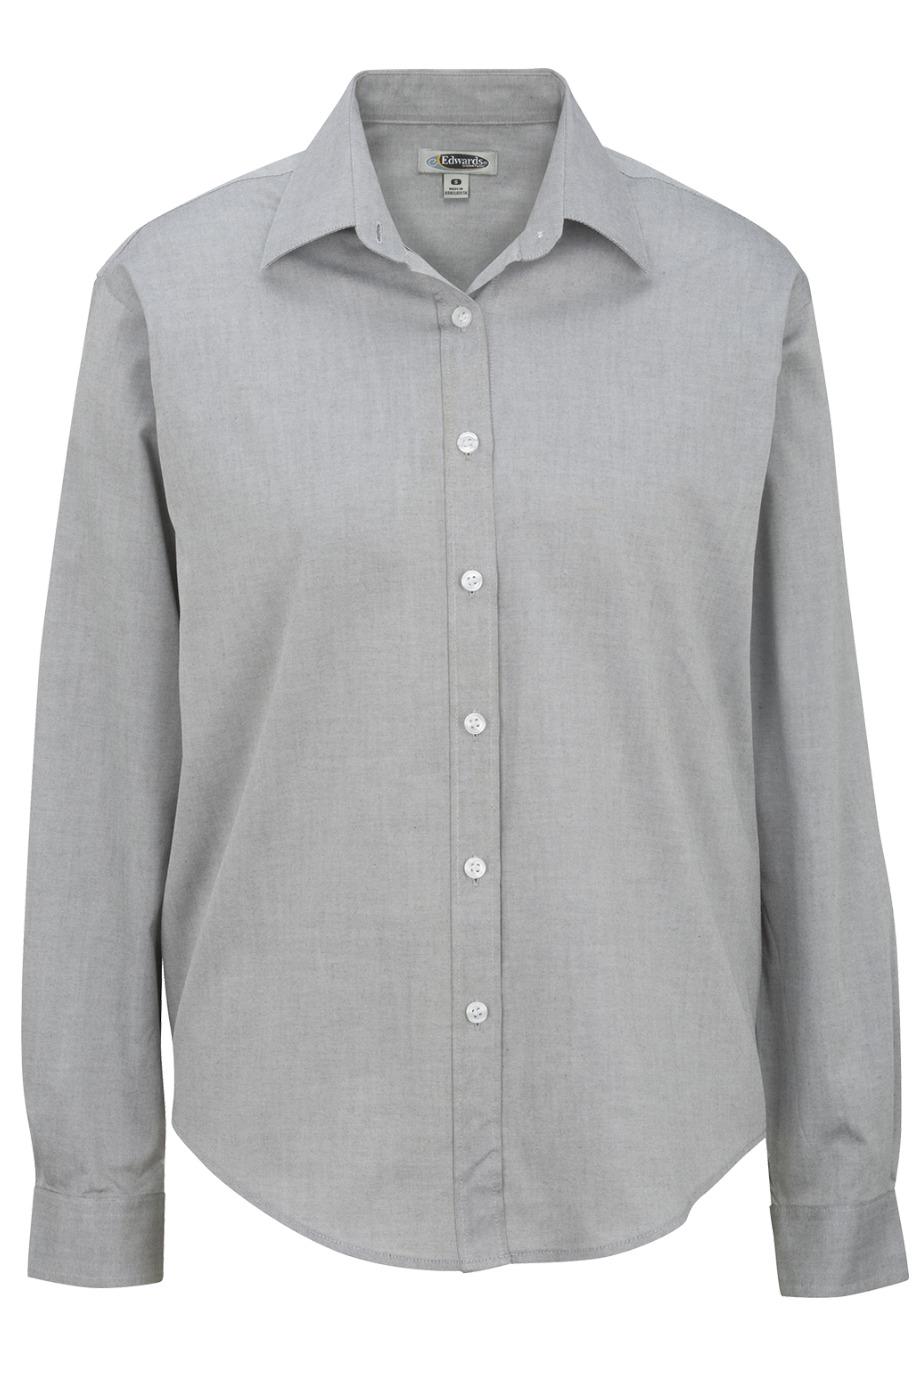 Edwards Garment 5975 - Women's Long Sleeve Pinpoint ...